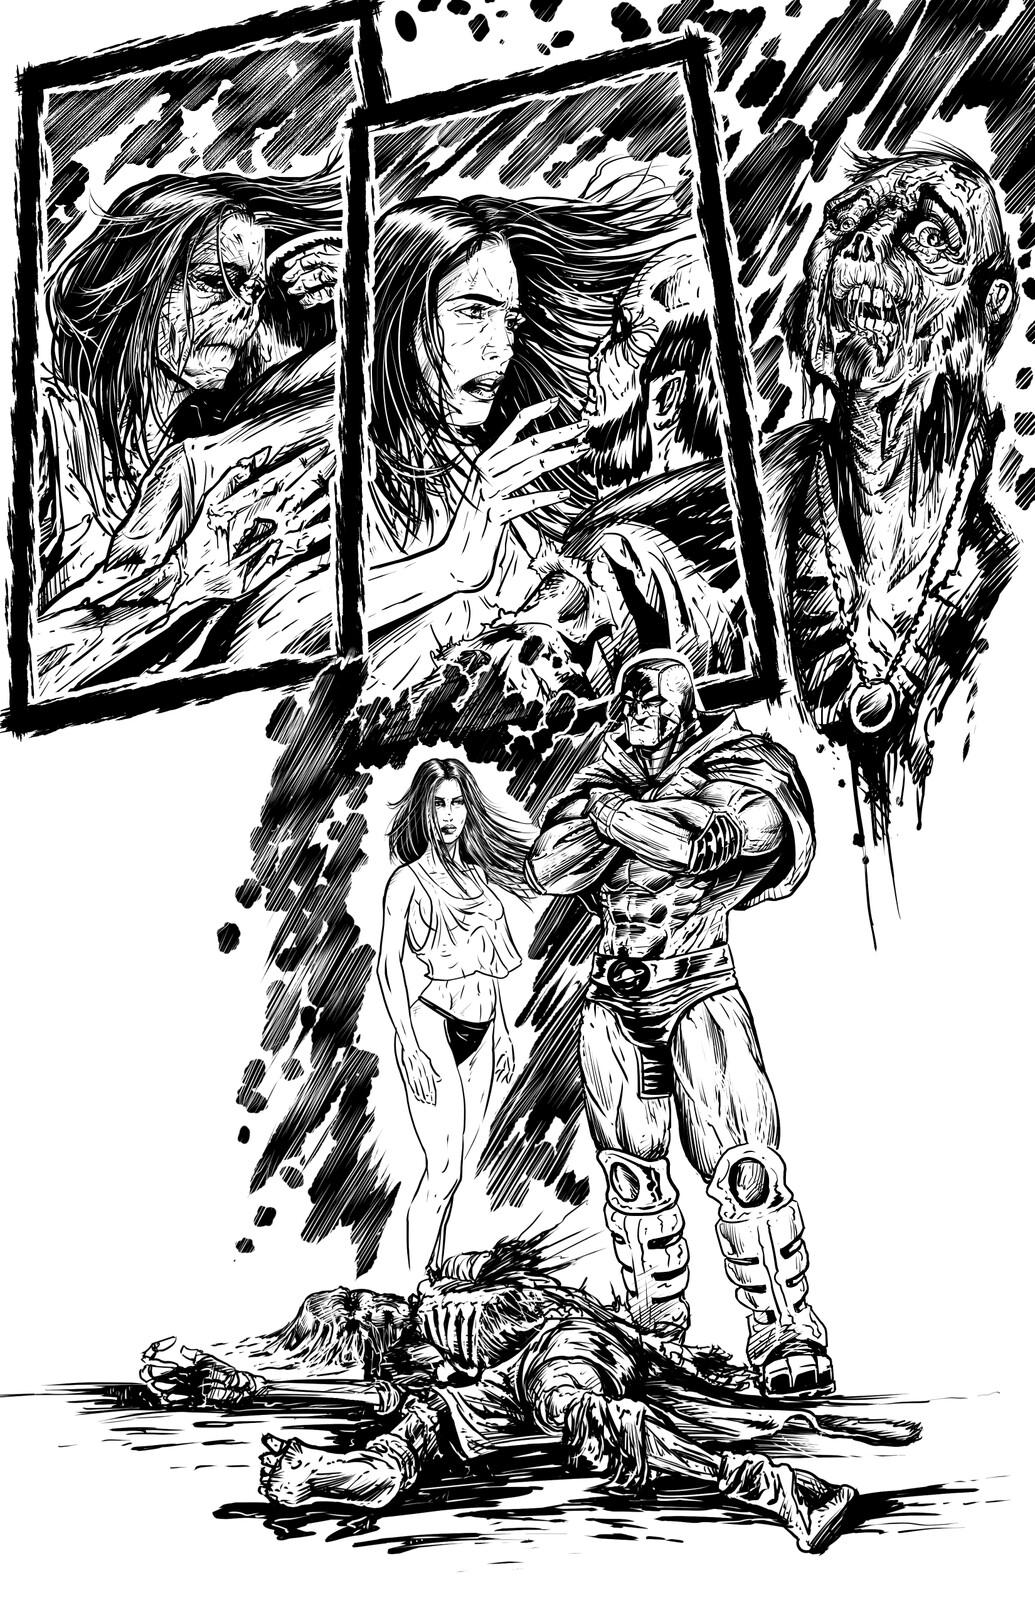 Johnny Saturn: Spiral City Noir, pg17